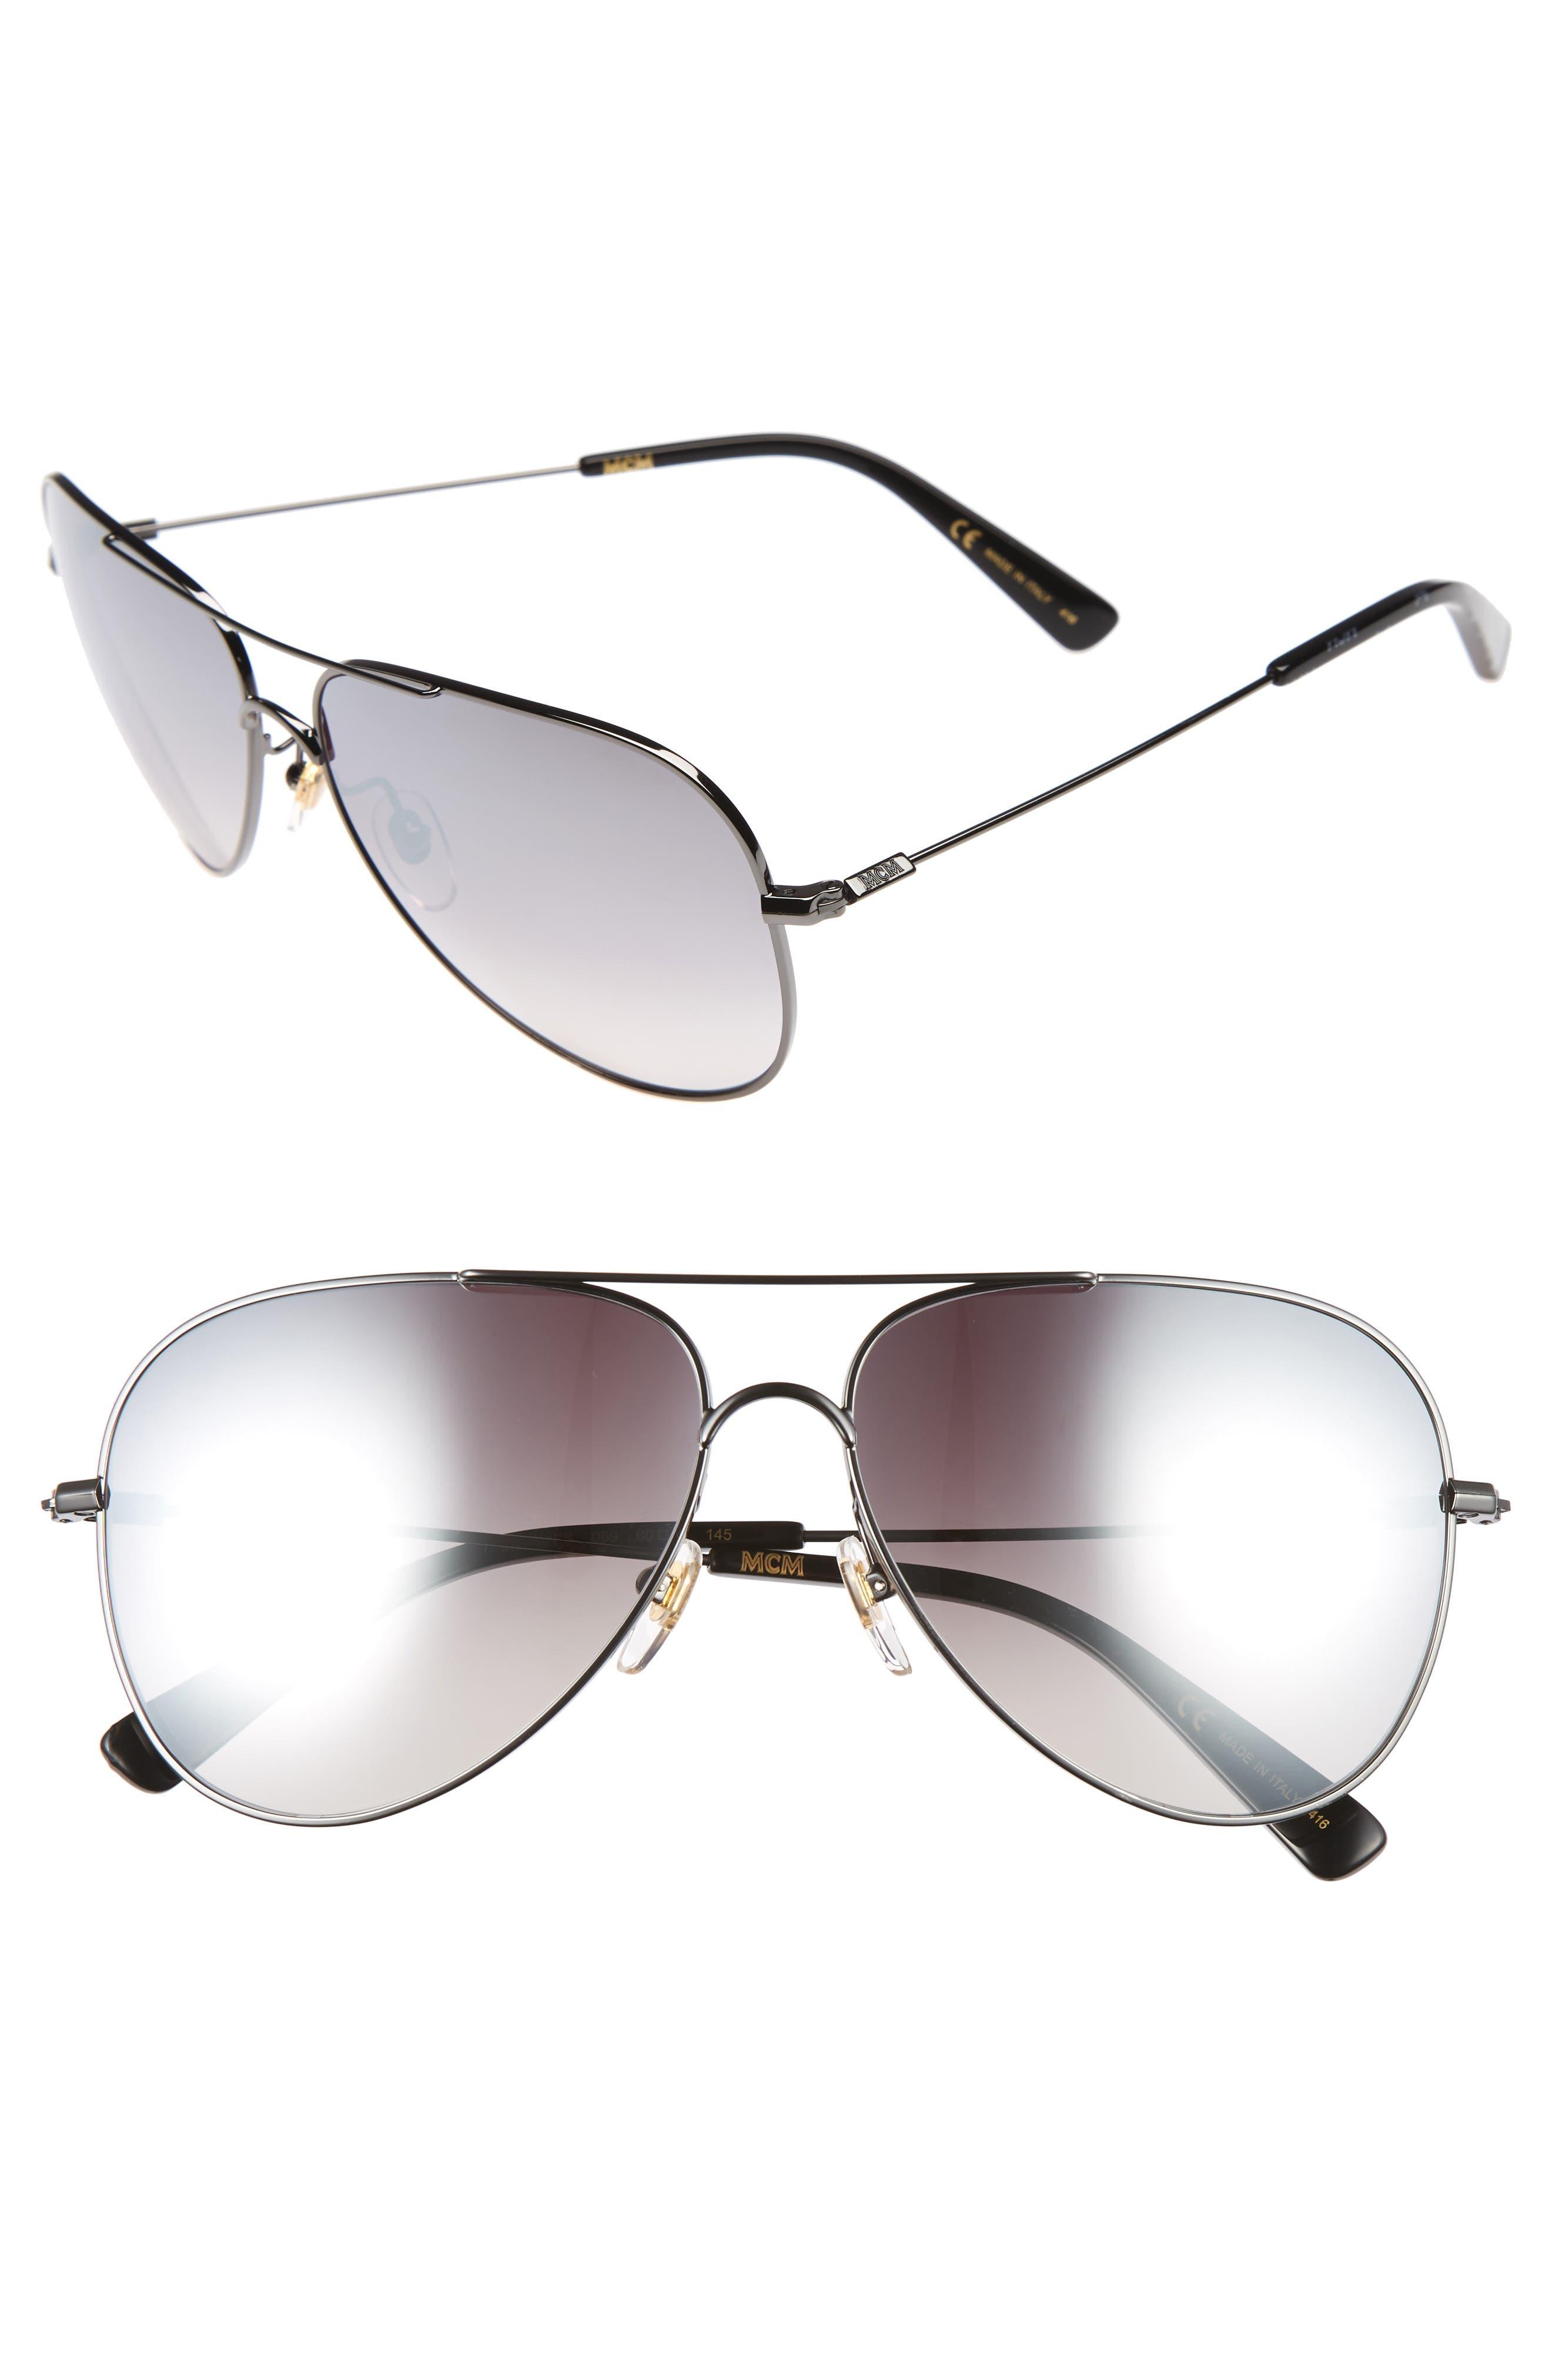 Alternate Image 1 Selected - MCM 60mm Aviator Sunglasses